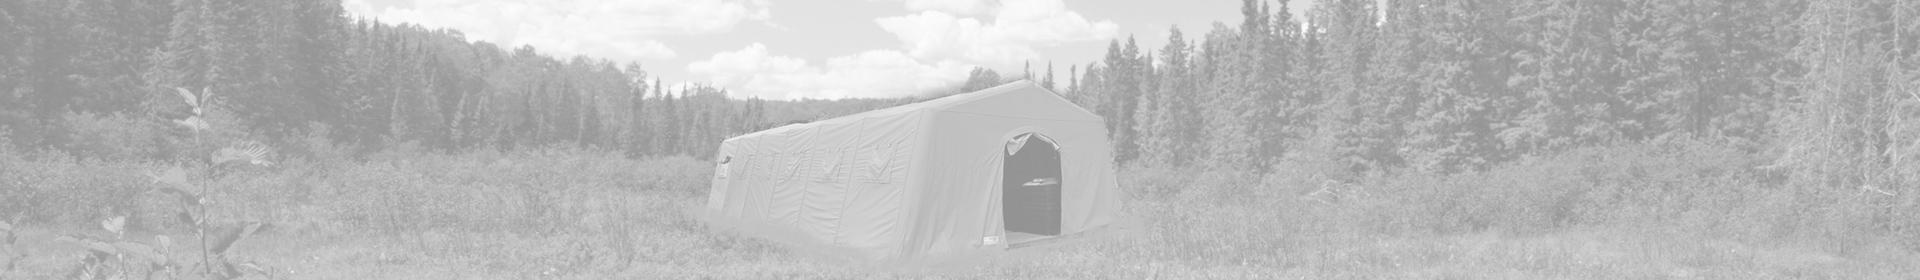 m-tent-slider-00